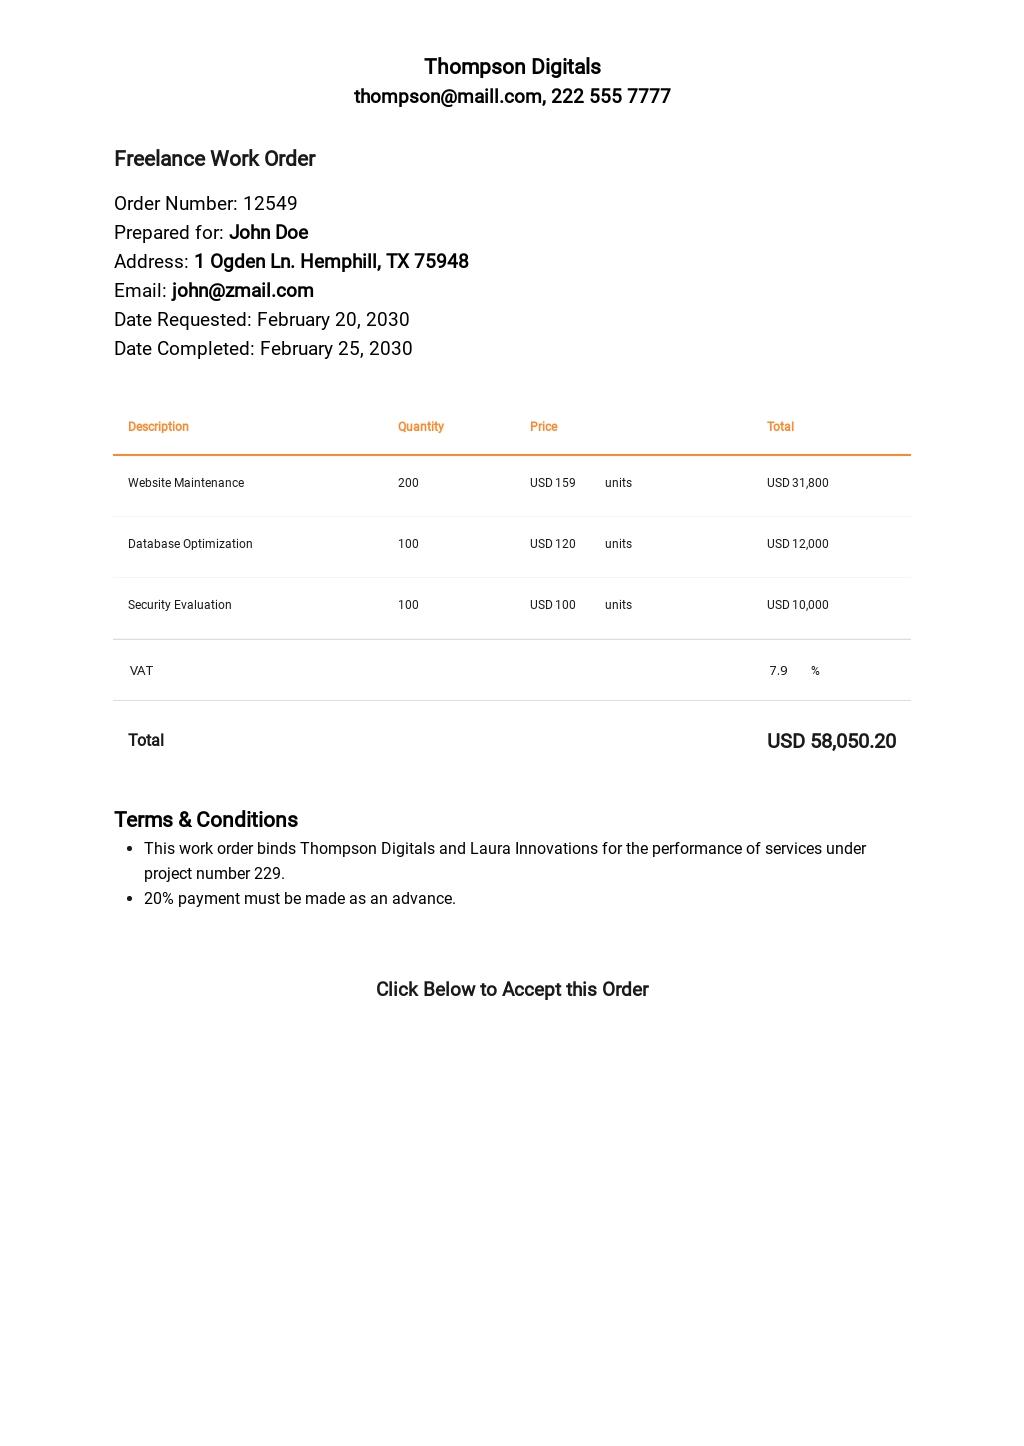 Sample Freelance Order Template